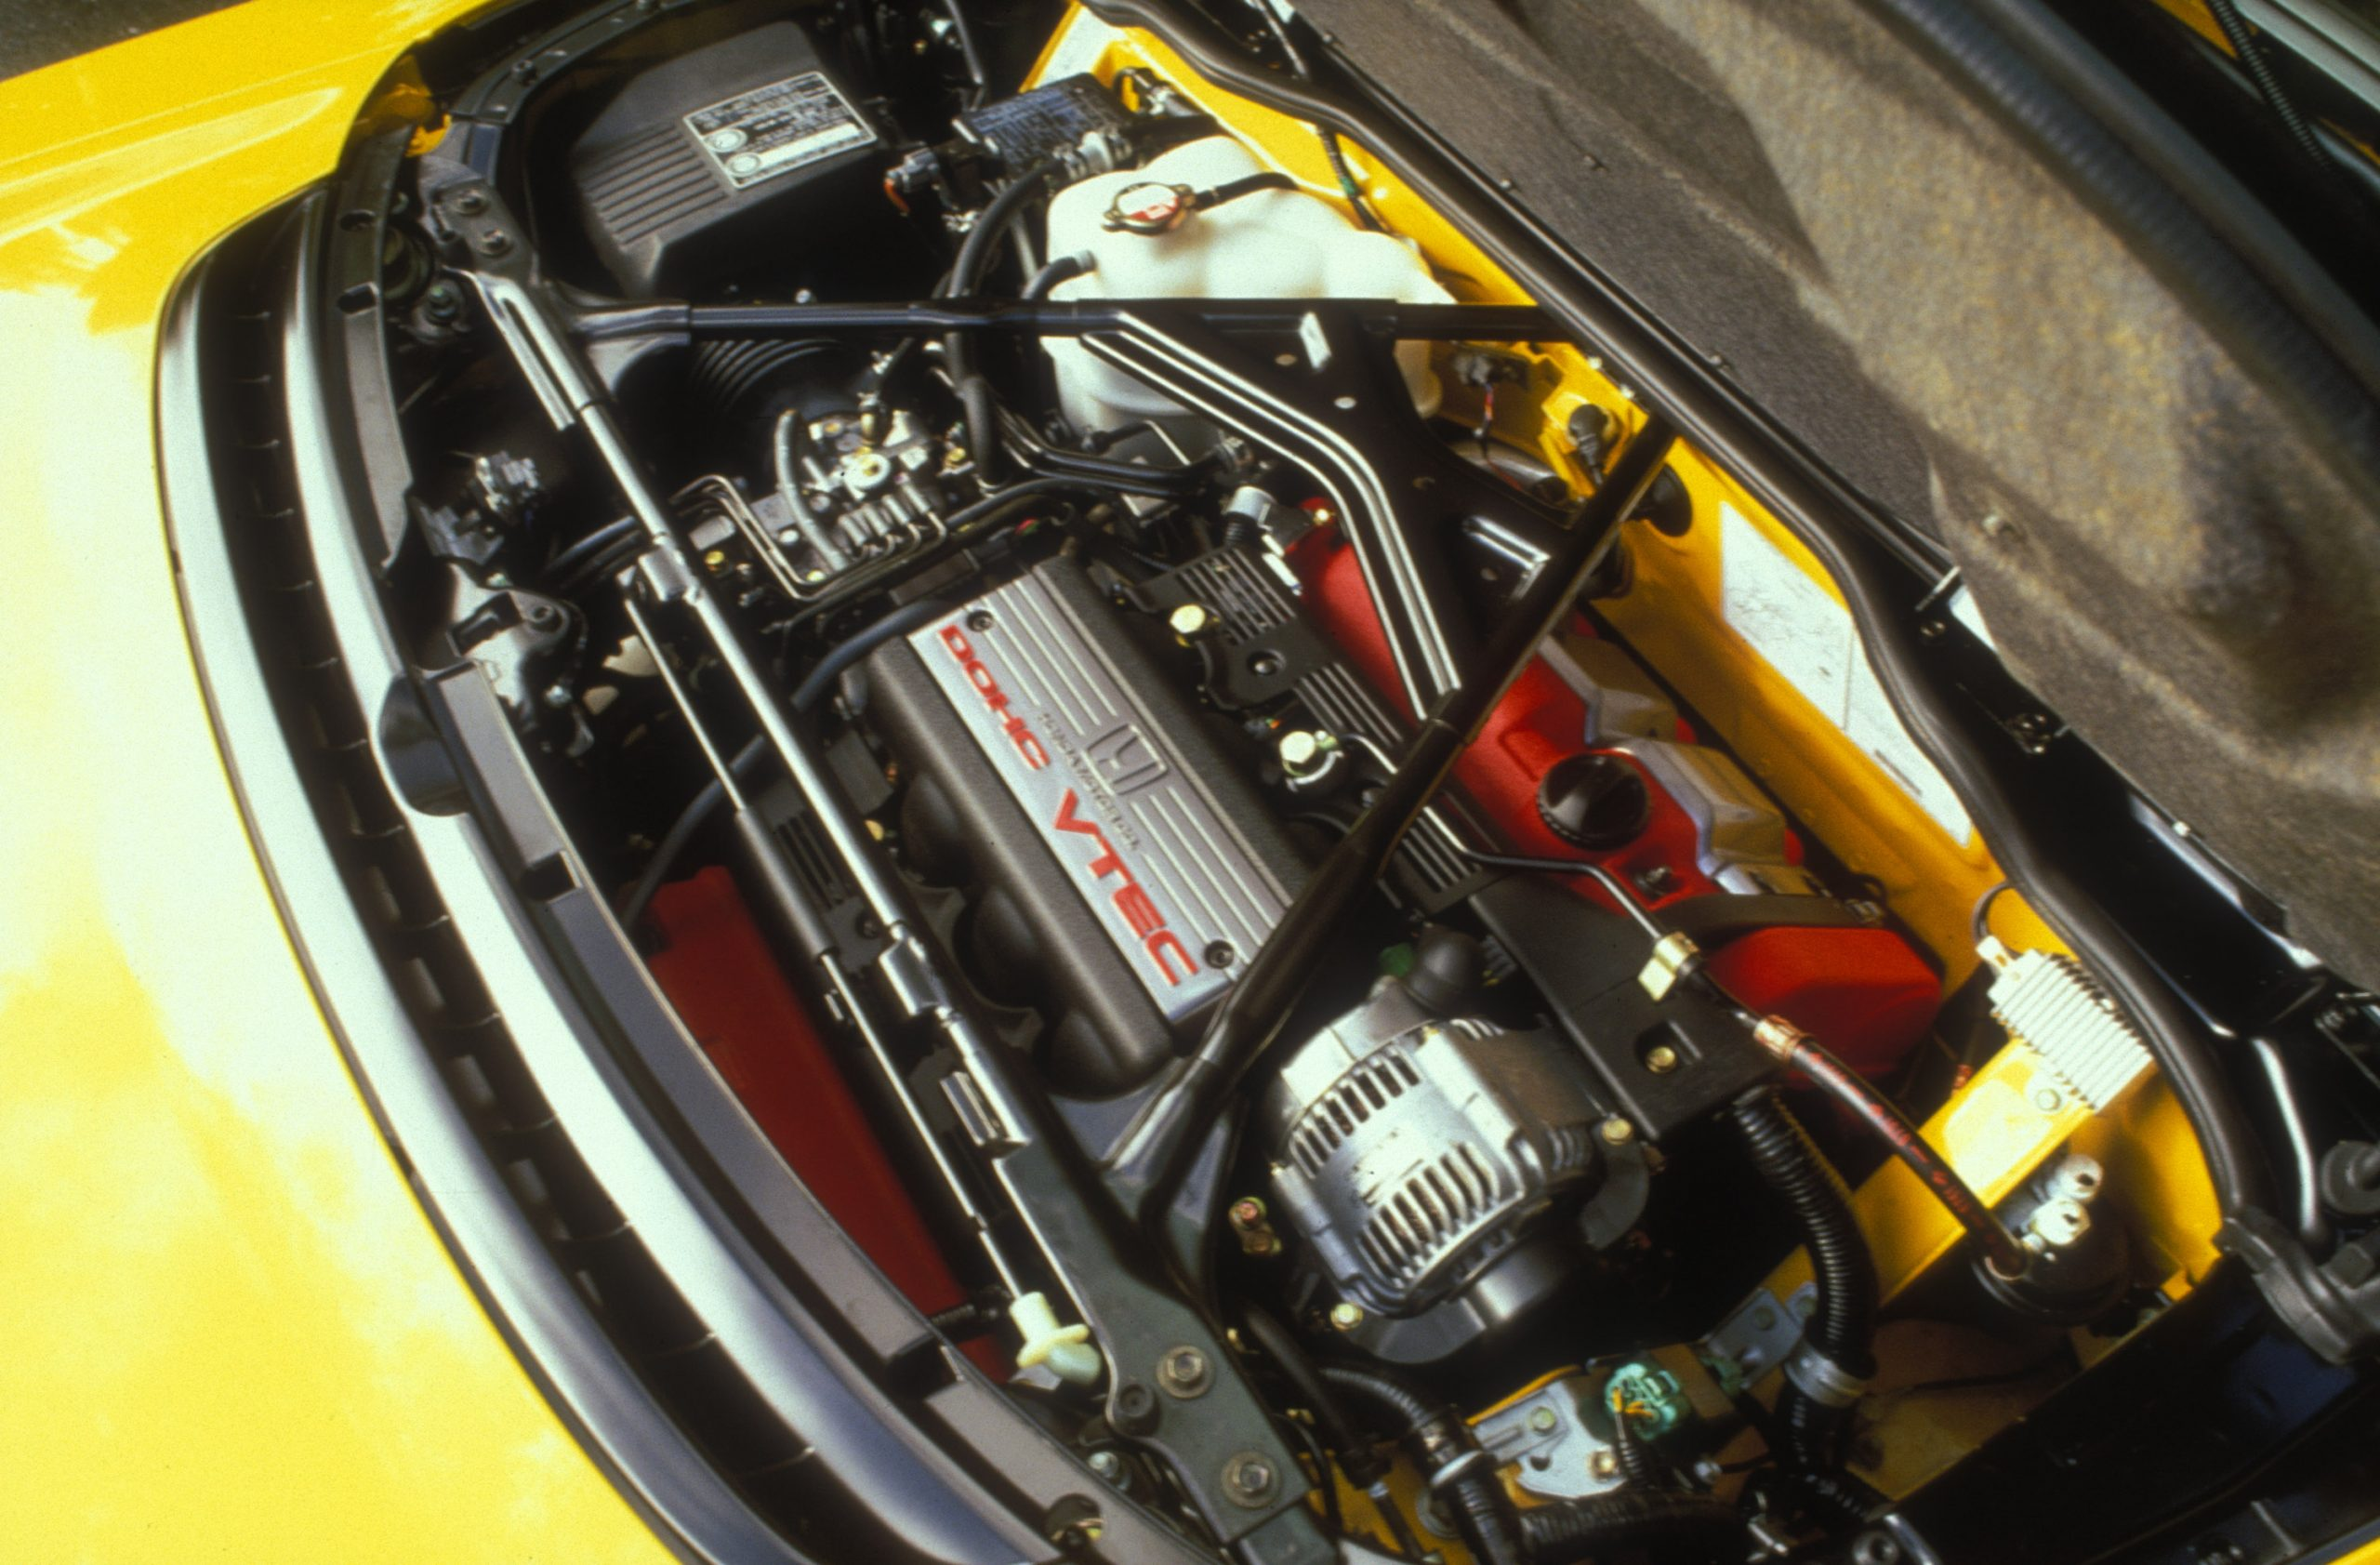 1997 Acura NSX engine